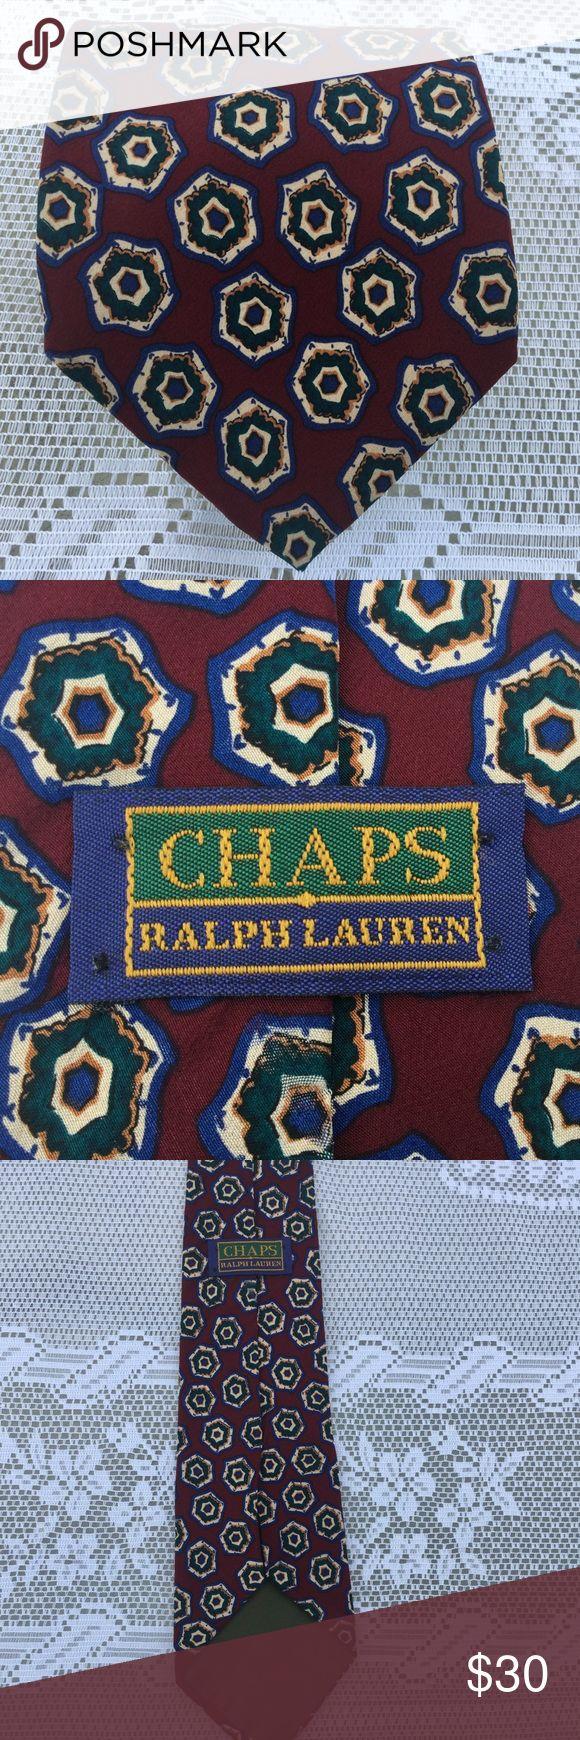 Chaps Ralph Lauren Tie Chaps Ralph Lauren Tie Chaps Ralph Lauren Accessories Ties